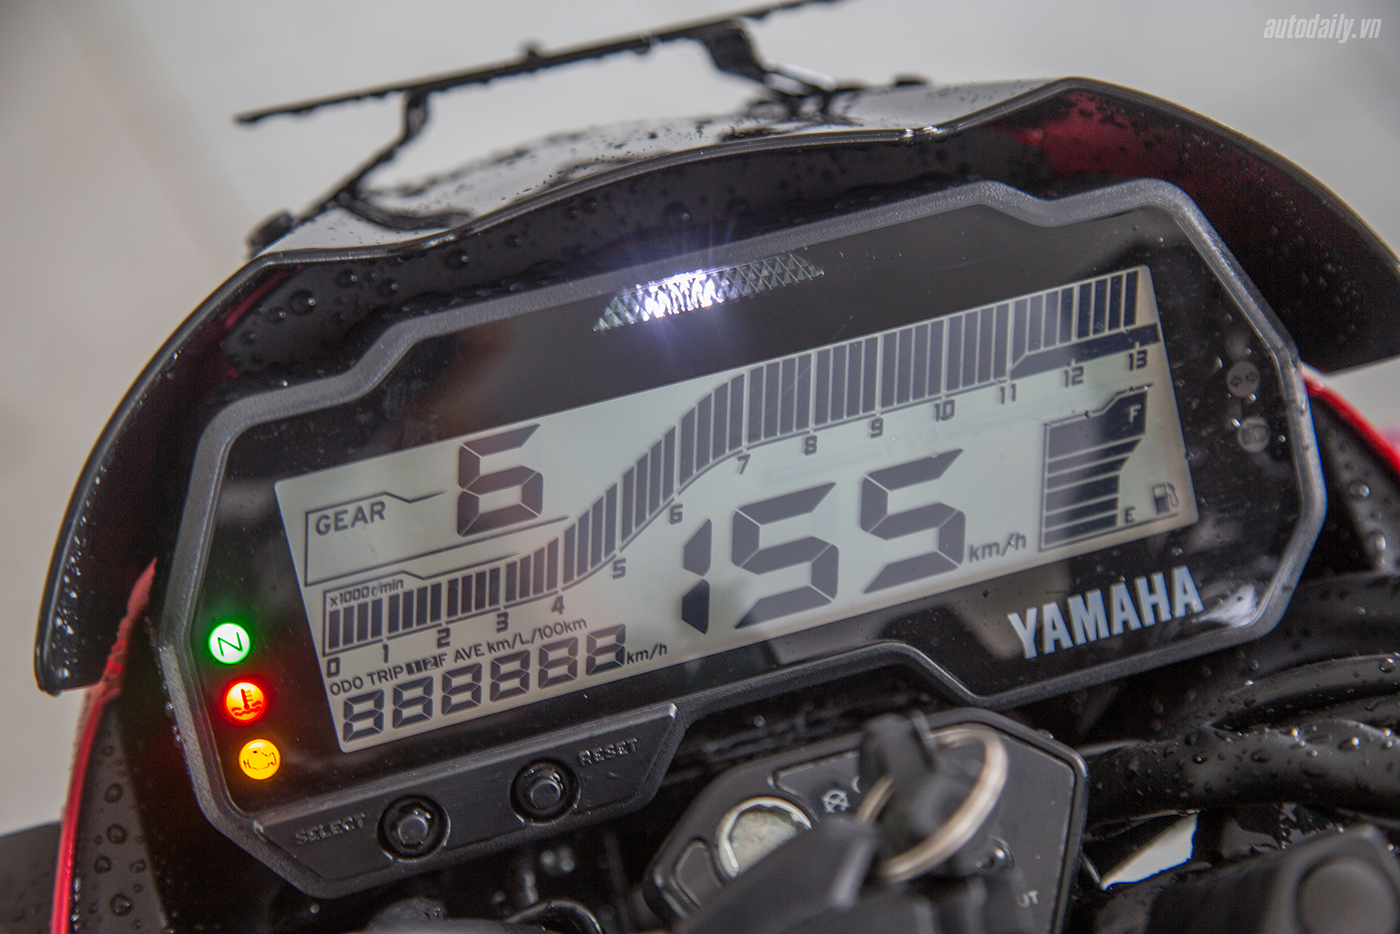 yamaha-fz-150i-2017-4.jpg